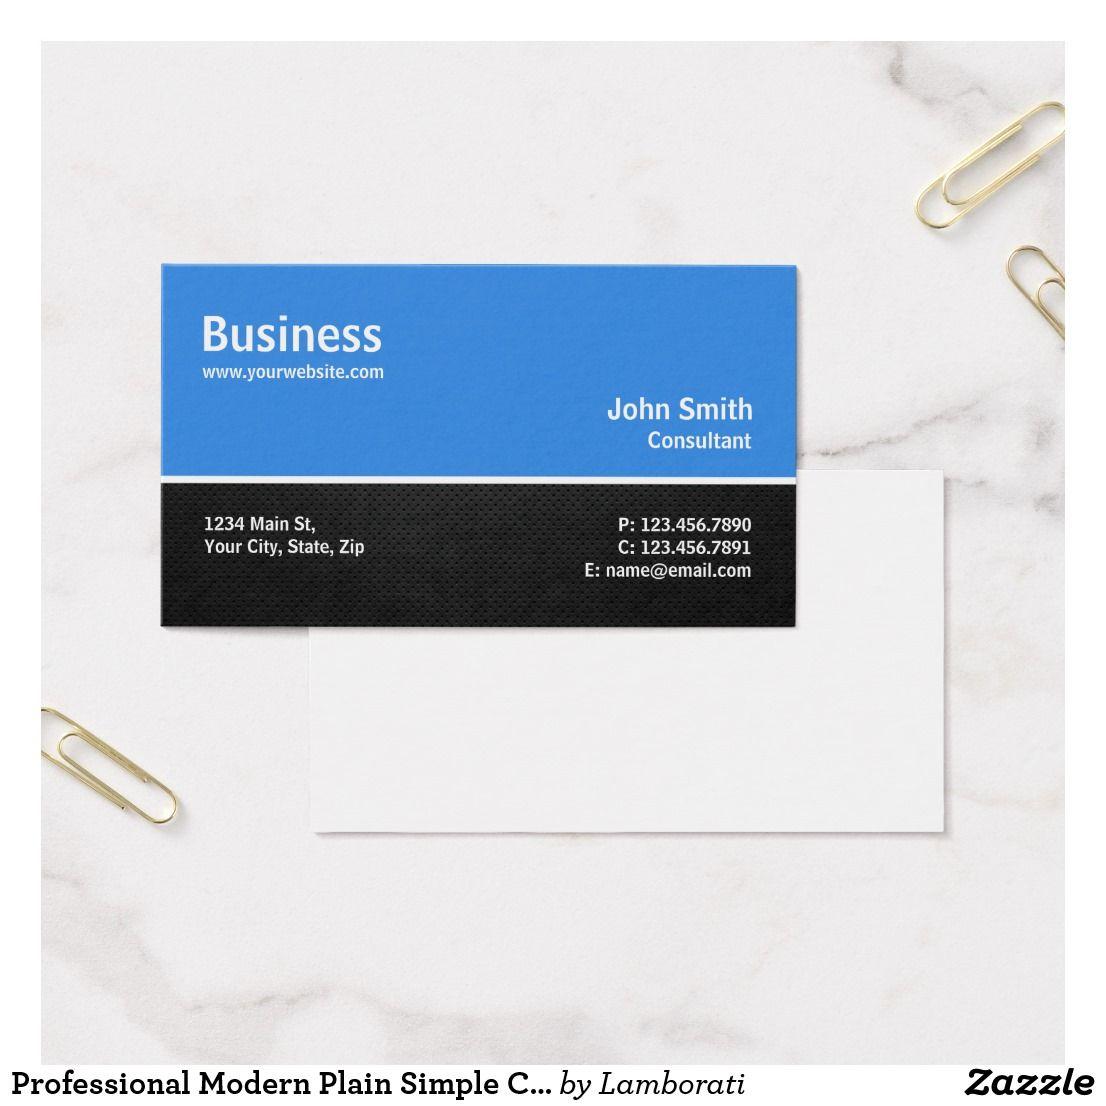 Professional Modern Plain Simple Computer Repair Business Card ...